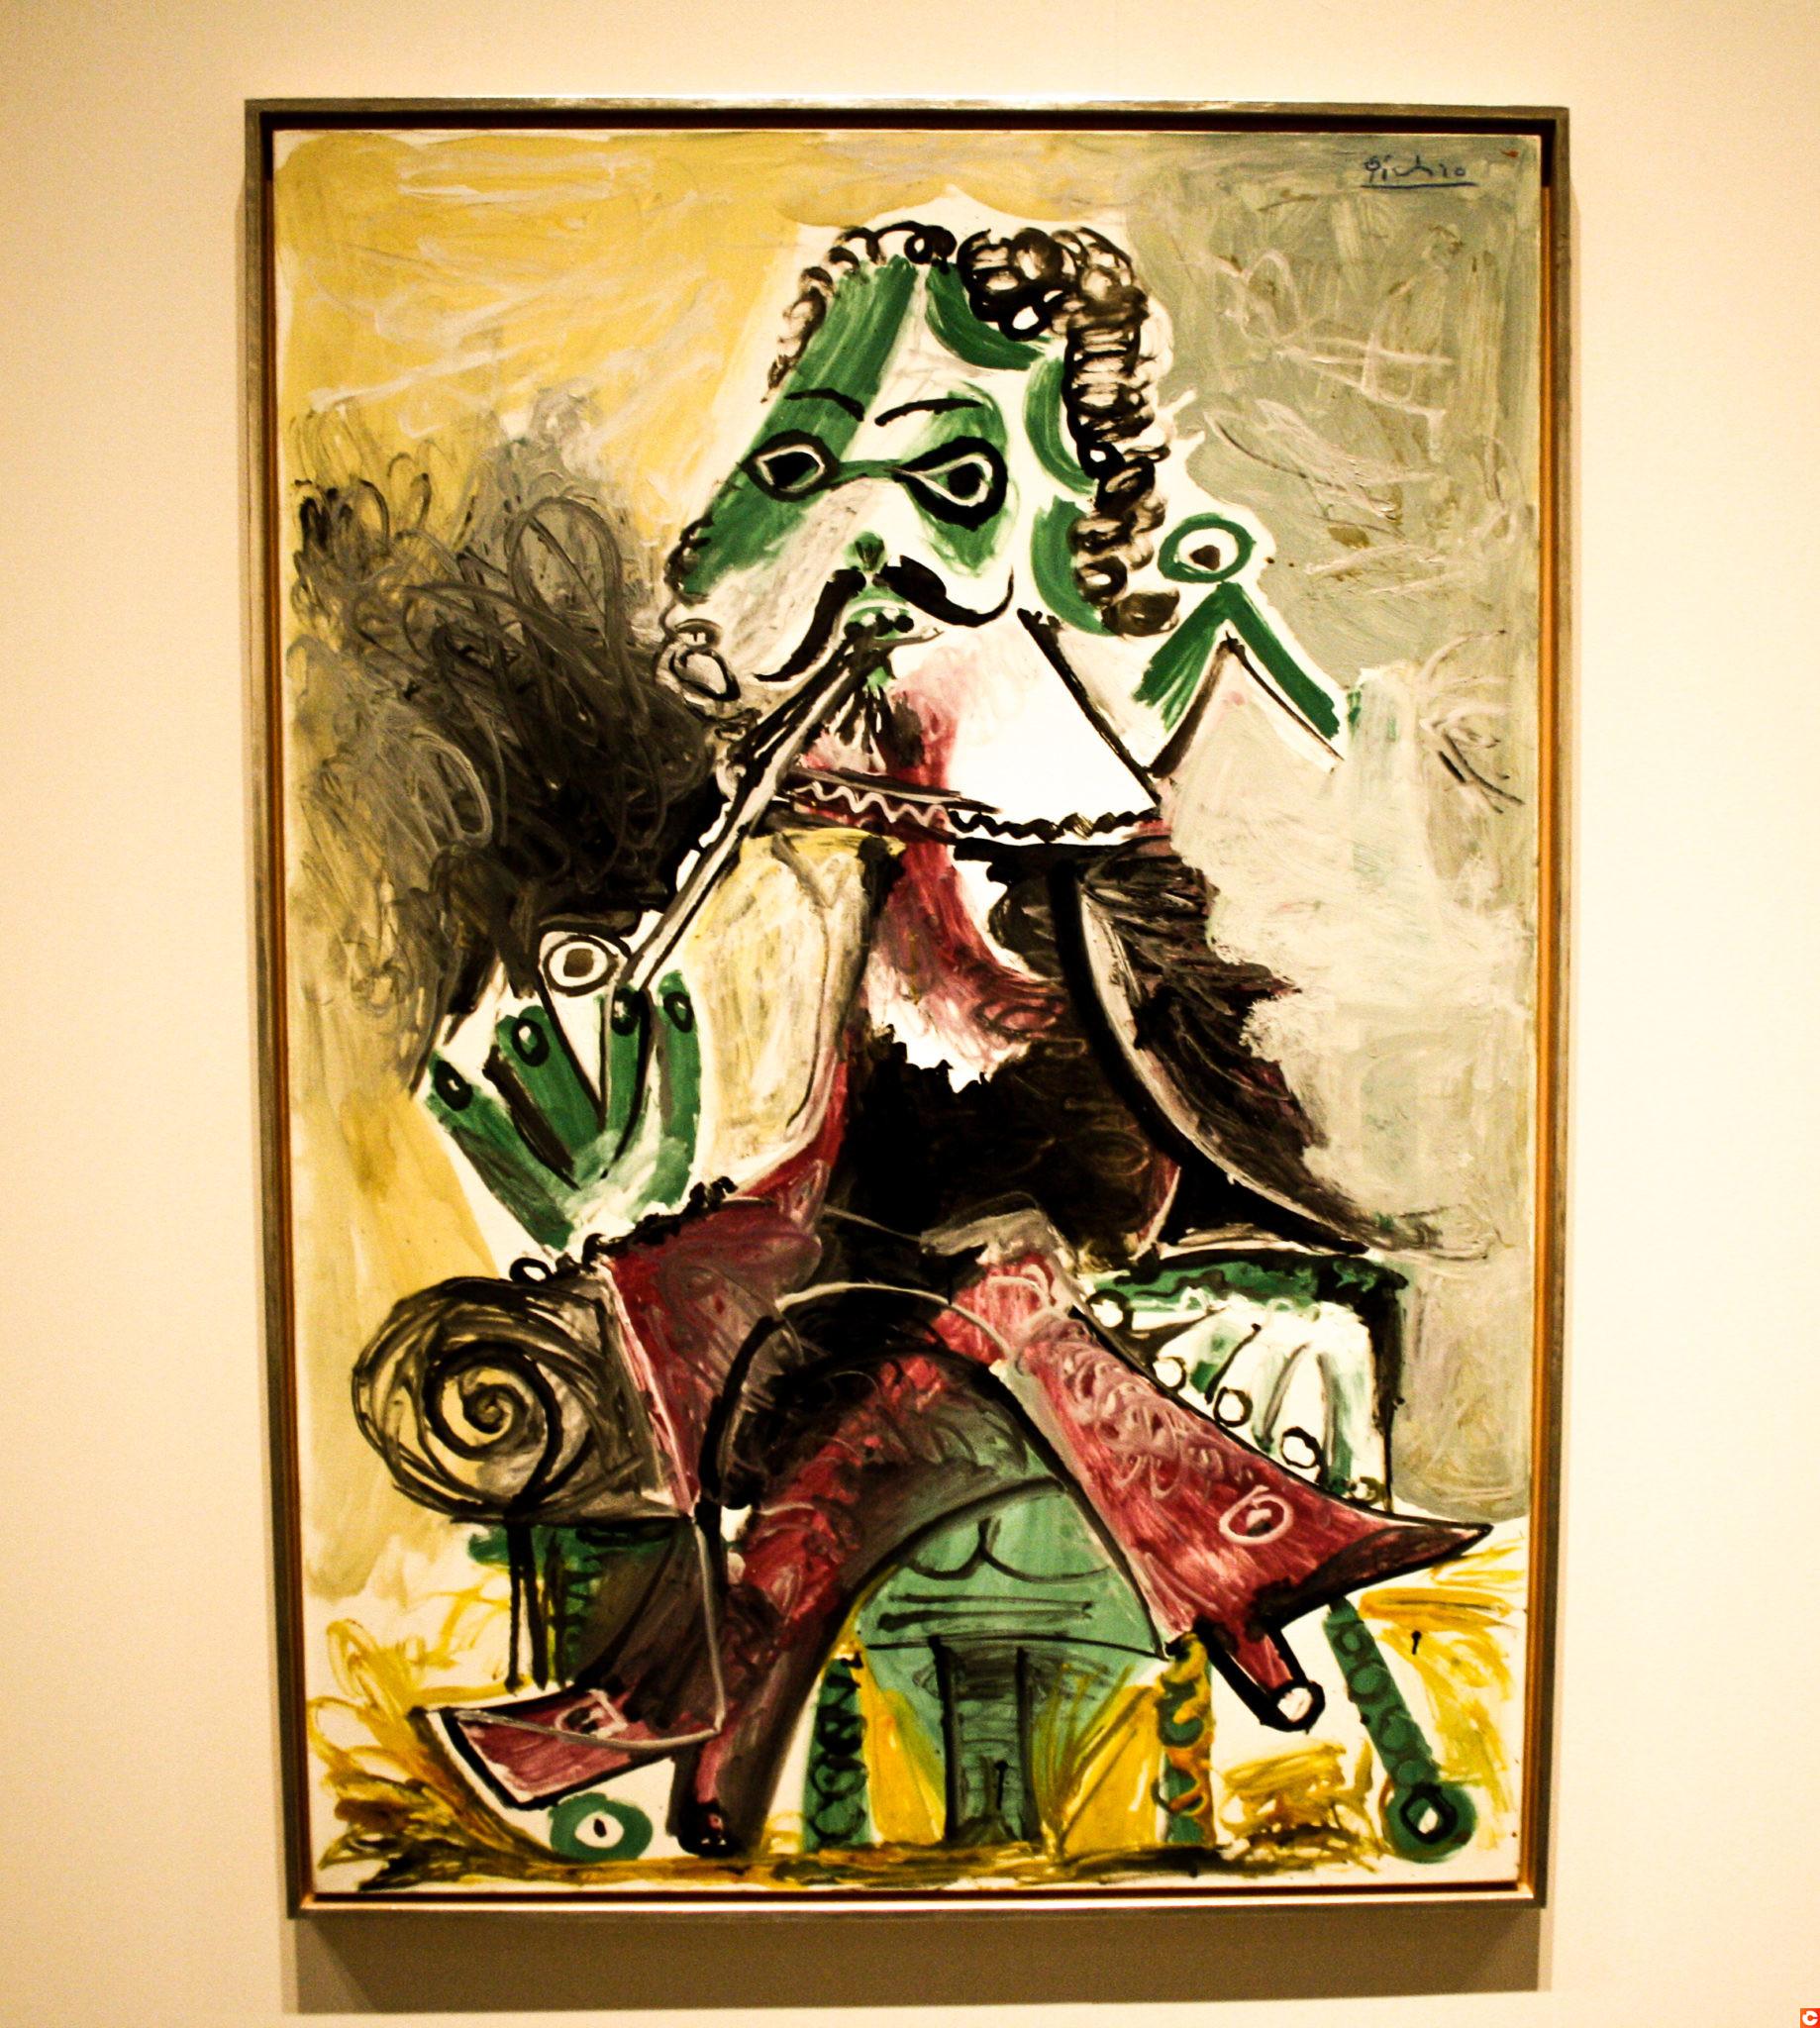 A picture in the Artium museum Mousquetaire à la pipe by Pablo Picasso, 1966